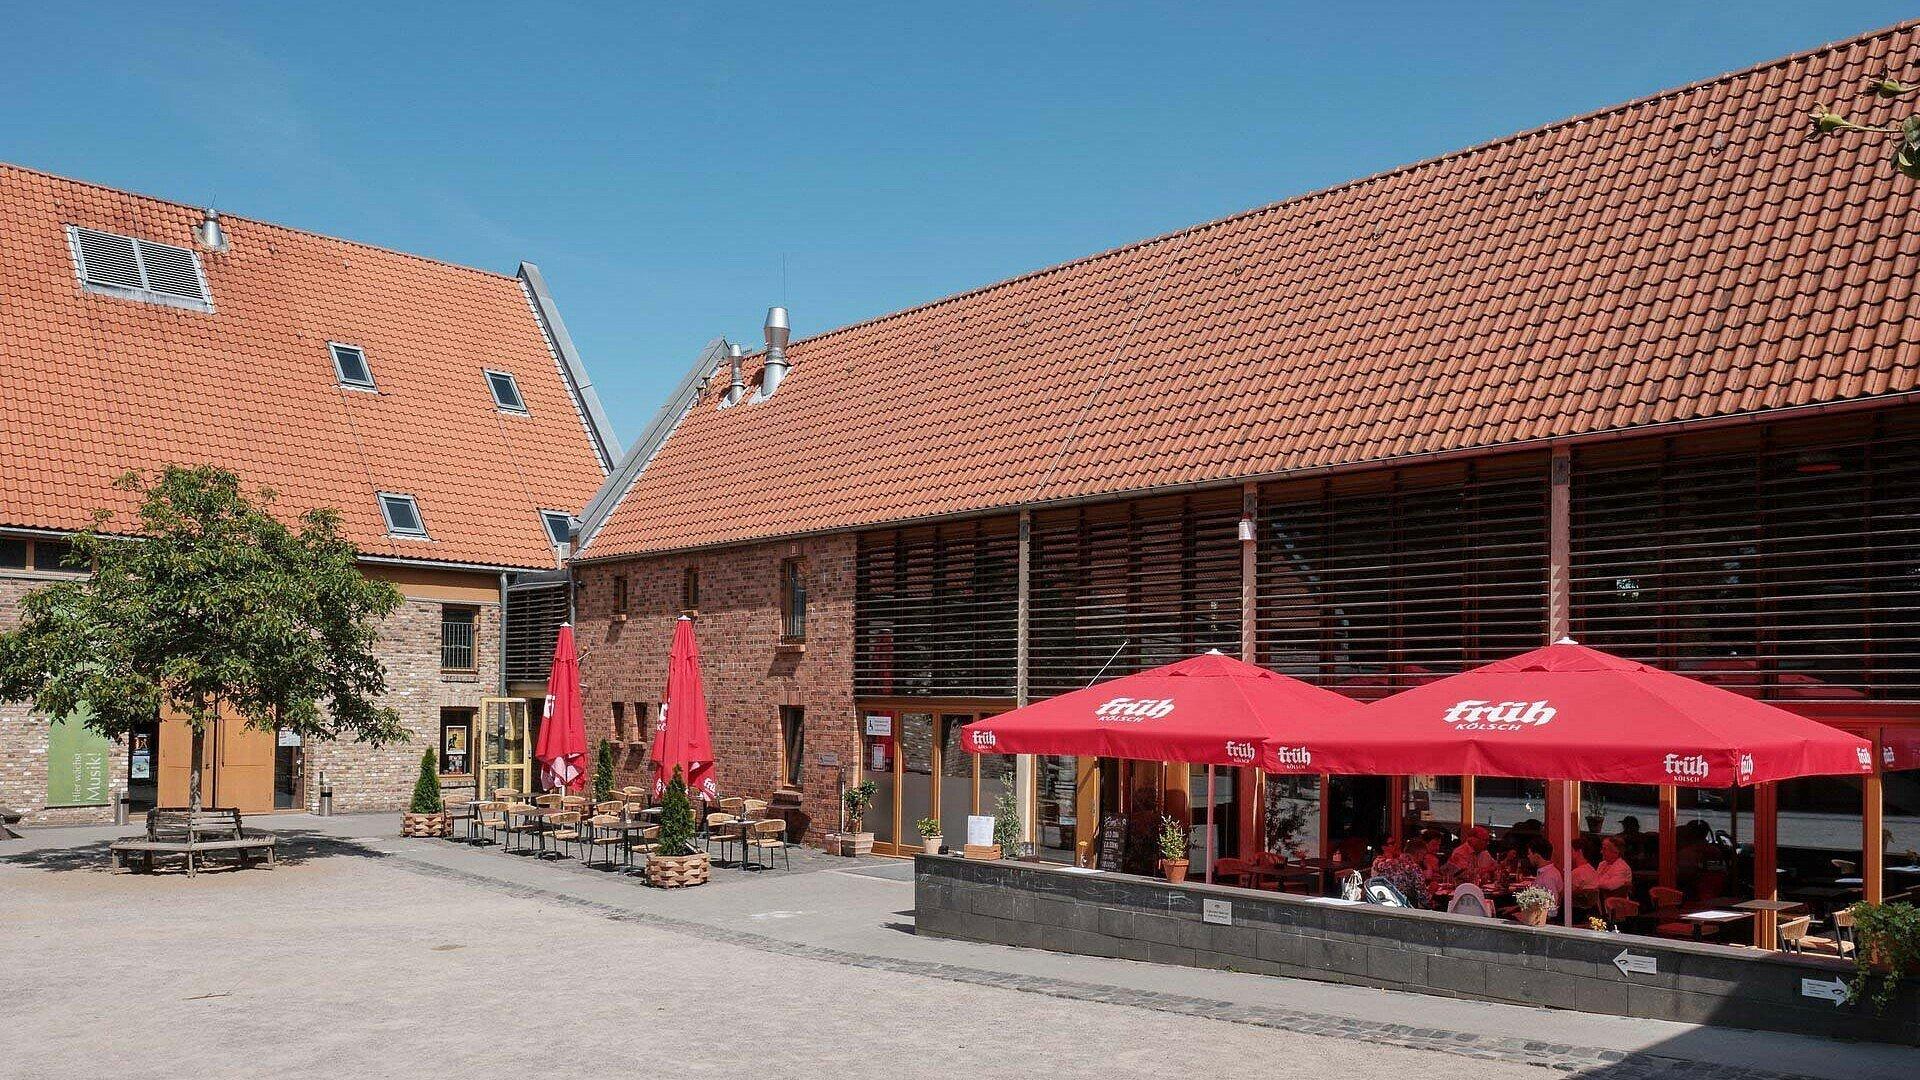 Biergarten Potpourri im Altenberger Hof in Nippes